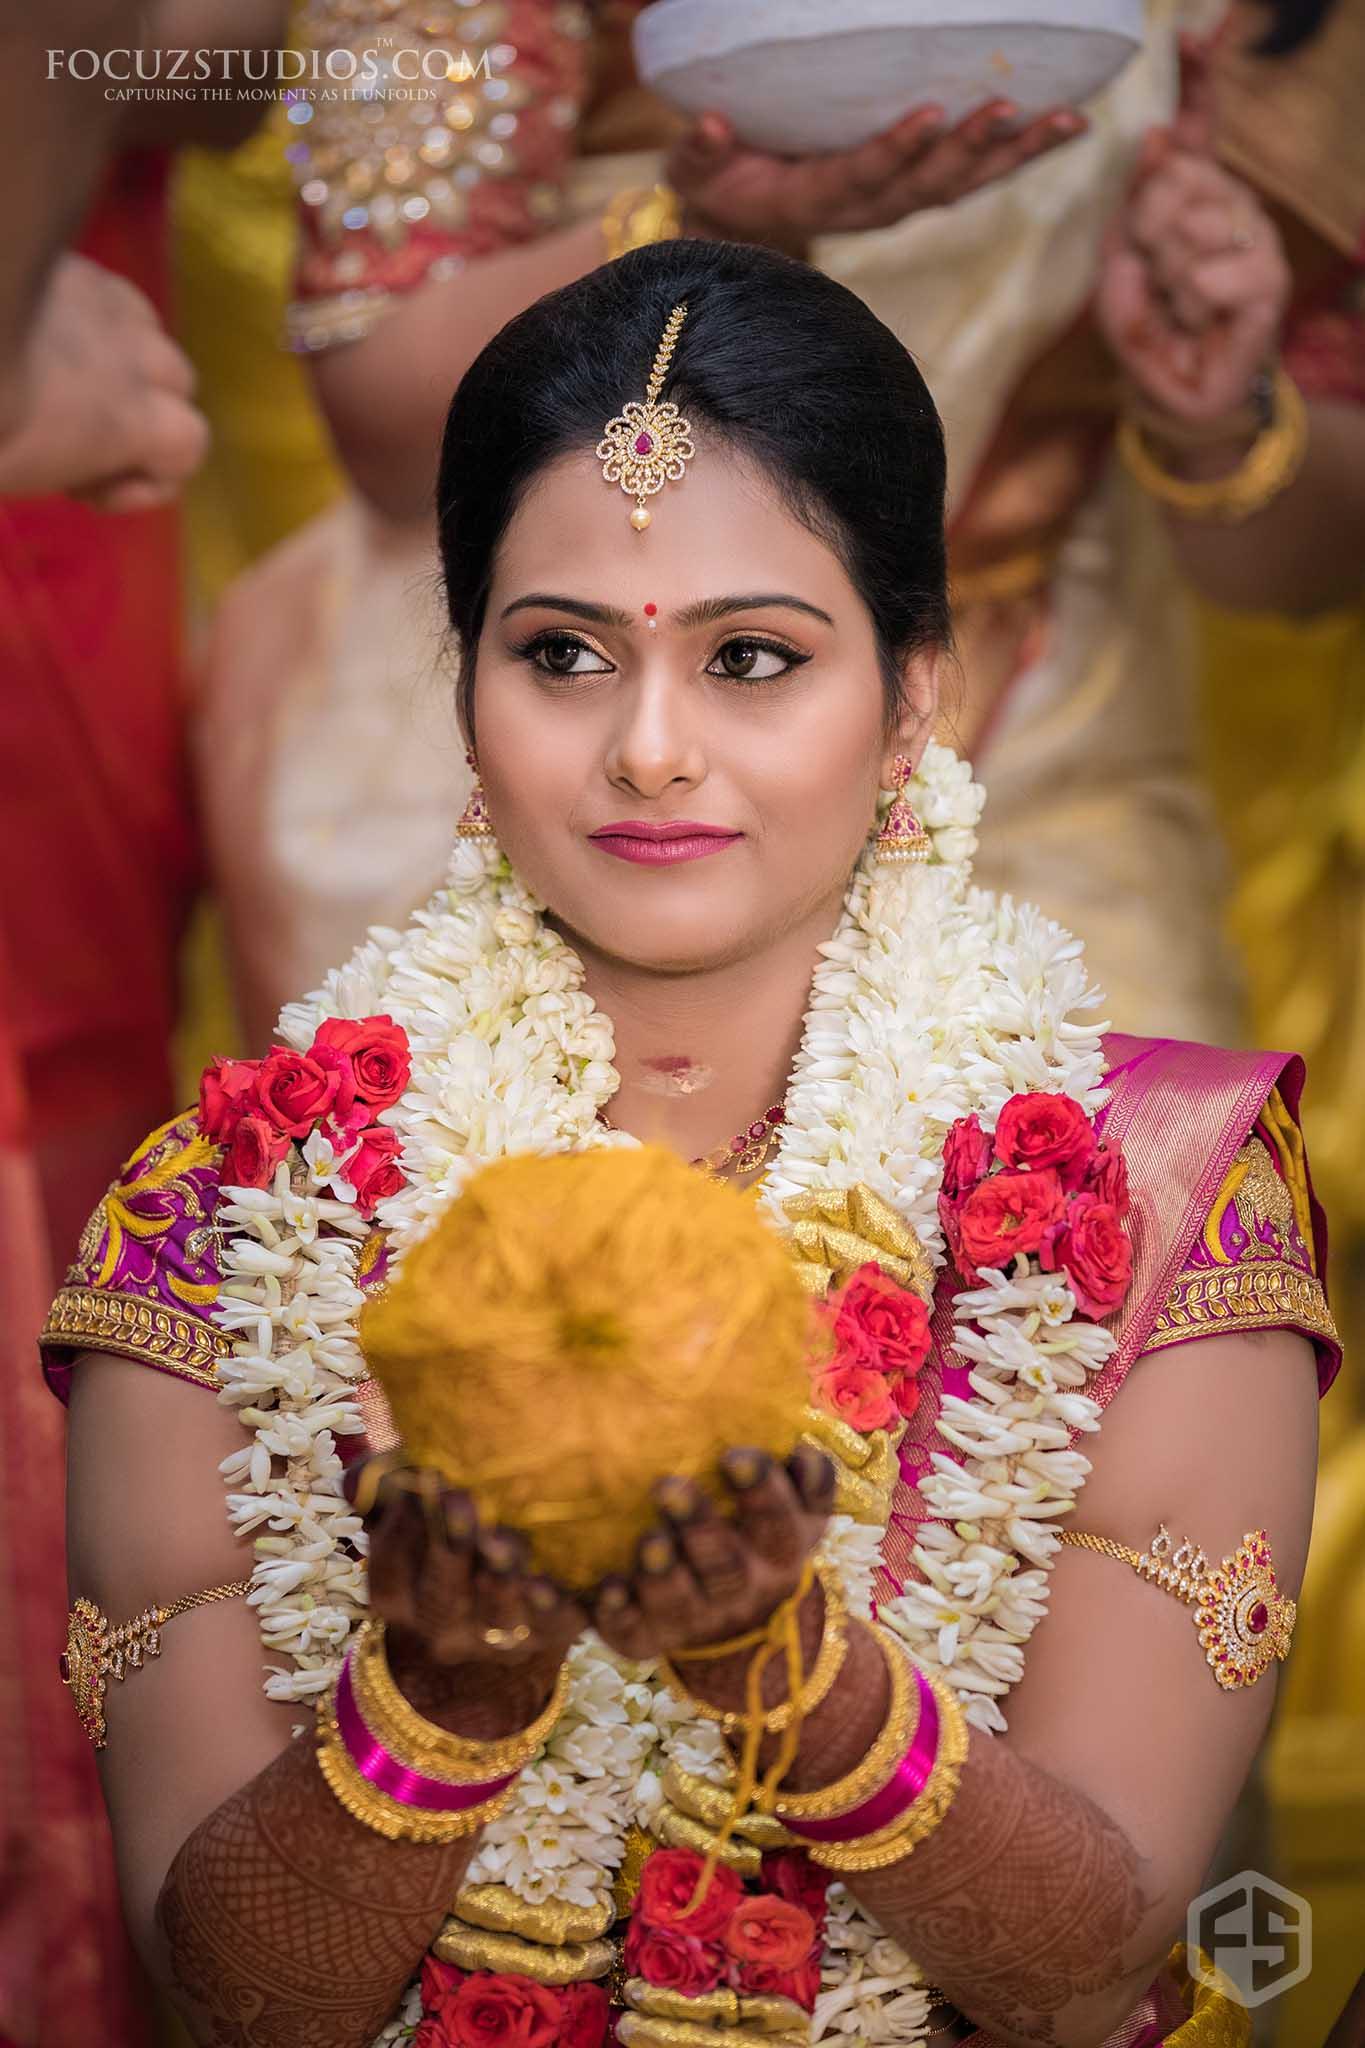 avm-rajeswari-kalyana-mandapam-wedding-photographers-photos-16